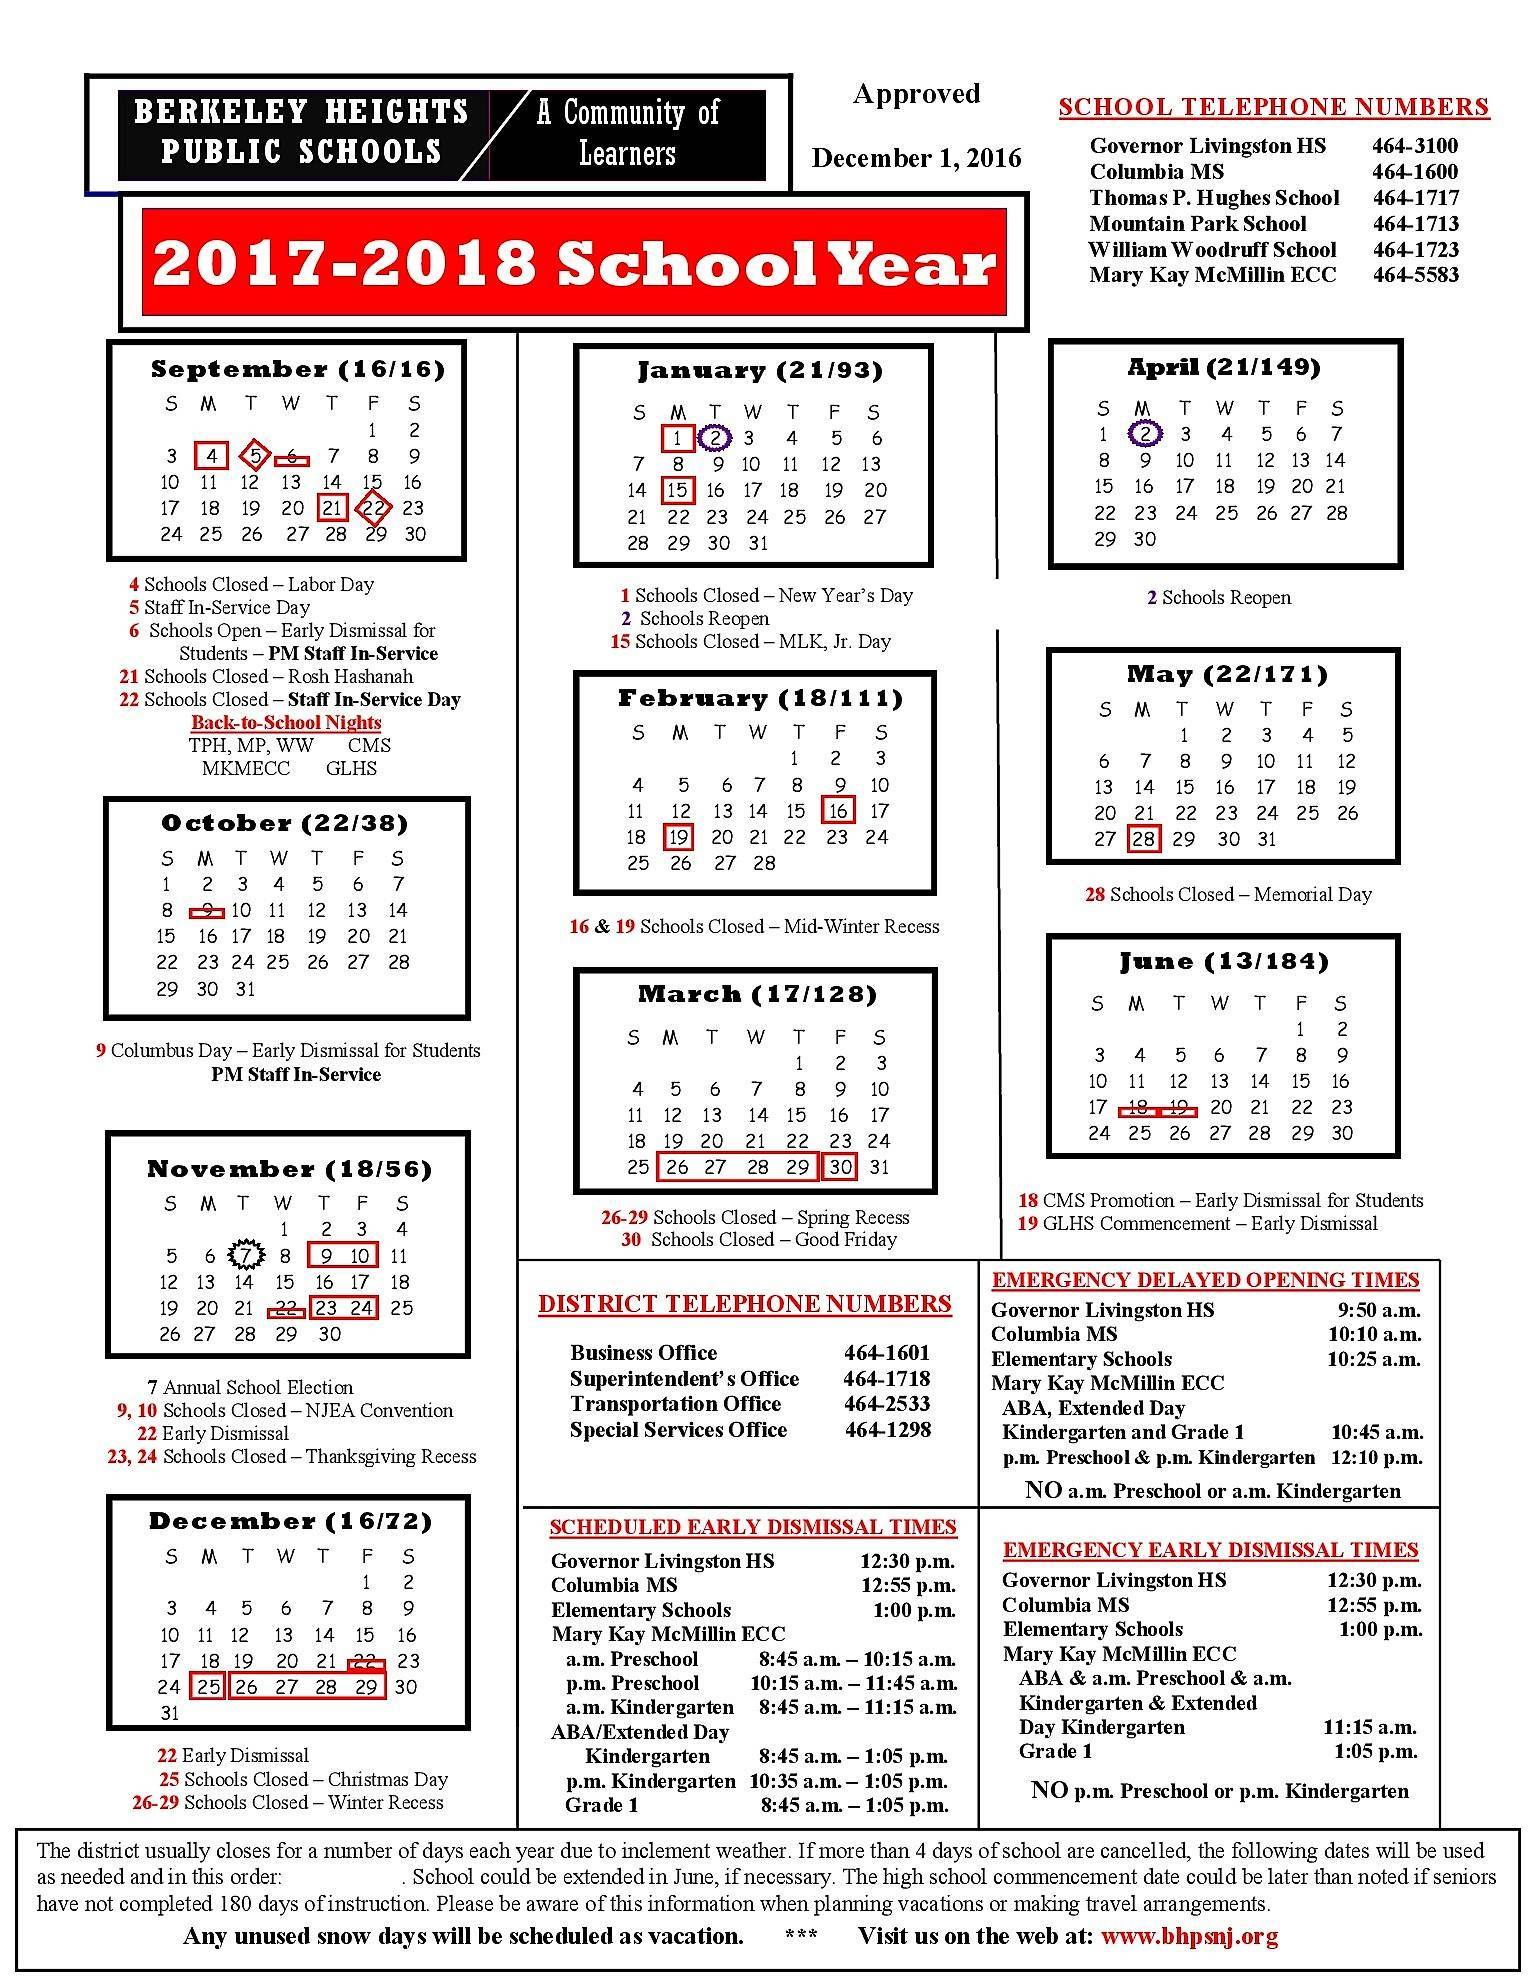 Berkeley County School Calendar 2016 2020 Berkeley Heights BOE Approves 2017 2018 School Calendar   TAPinto